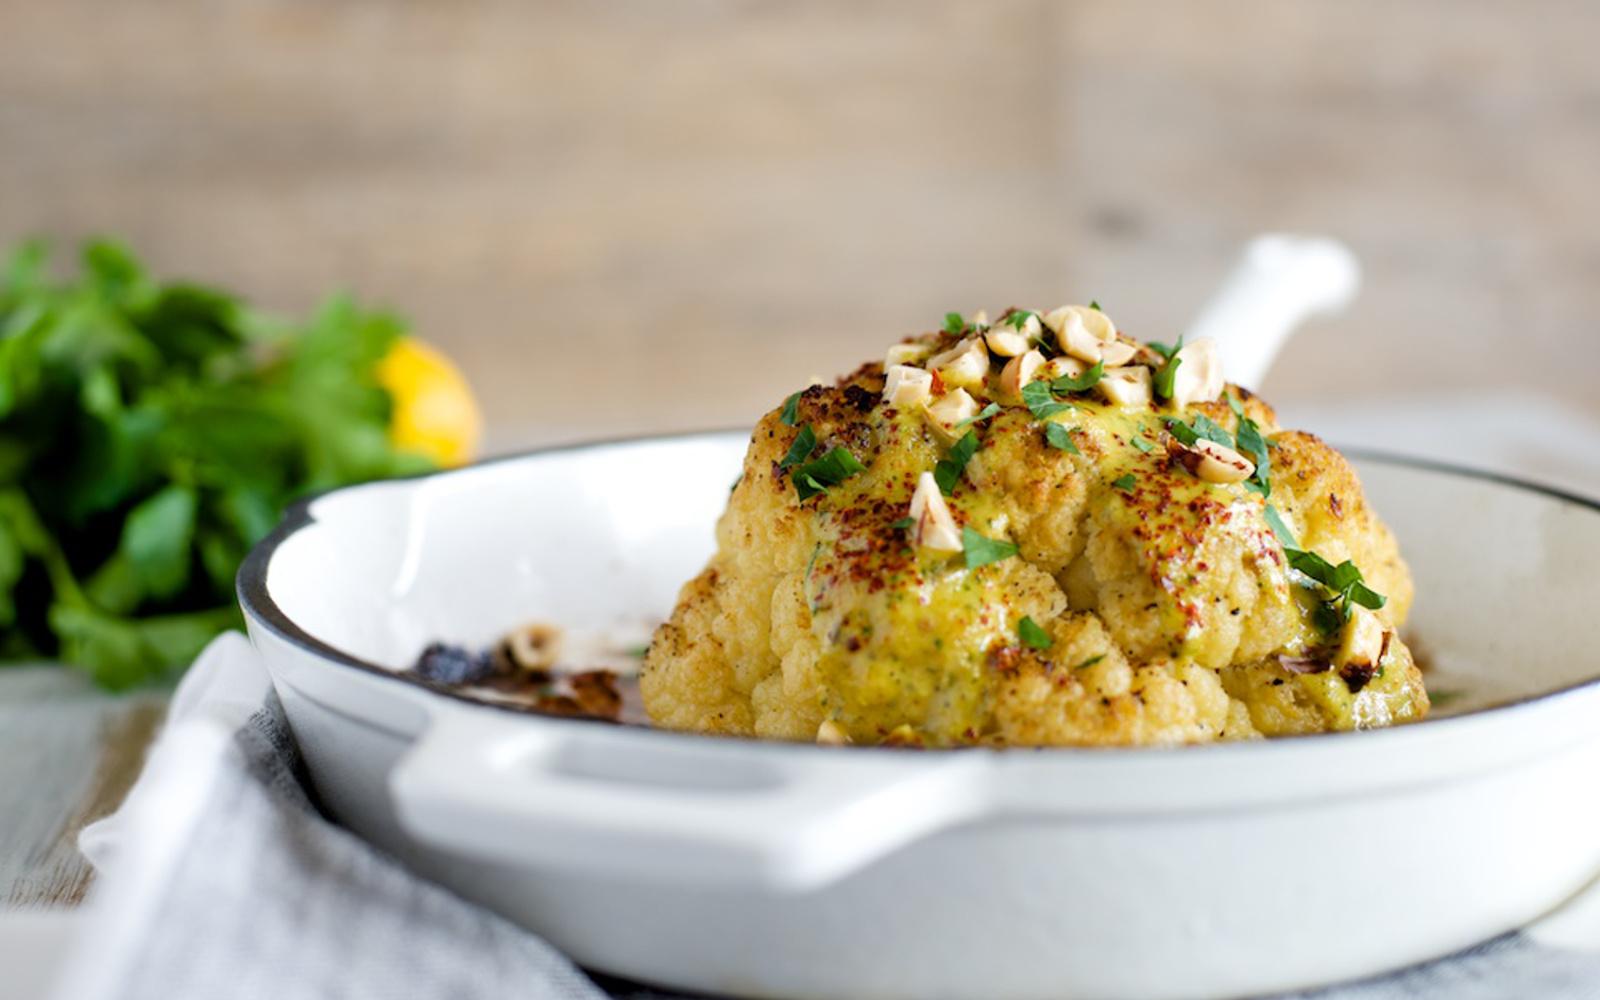 Whole Roasted Cauliflower With Calabrian Chili Tahini Sauce